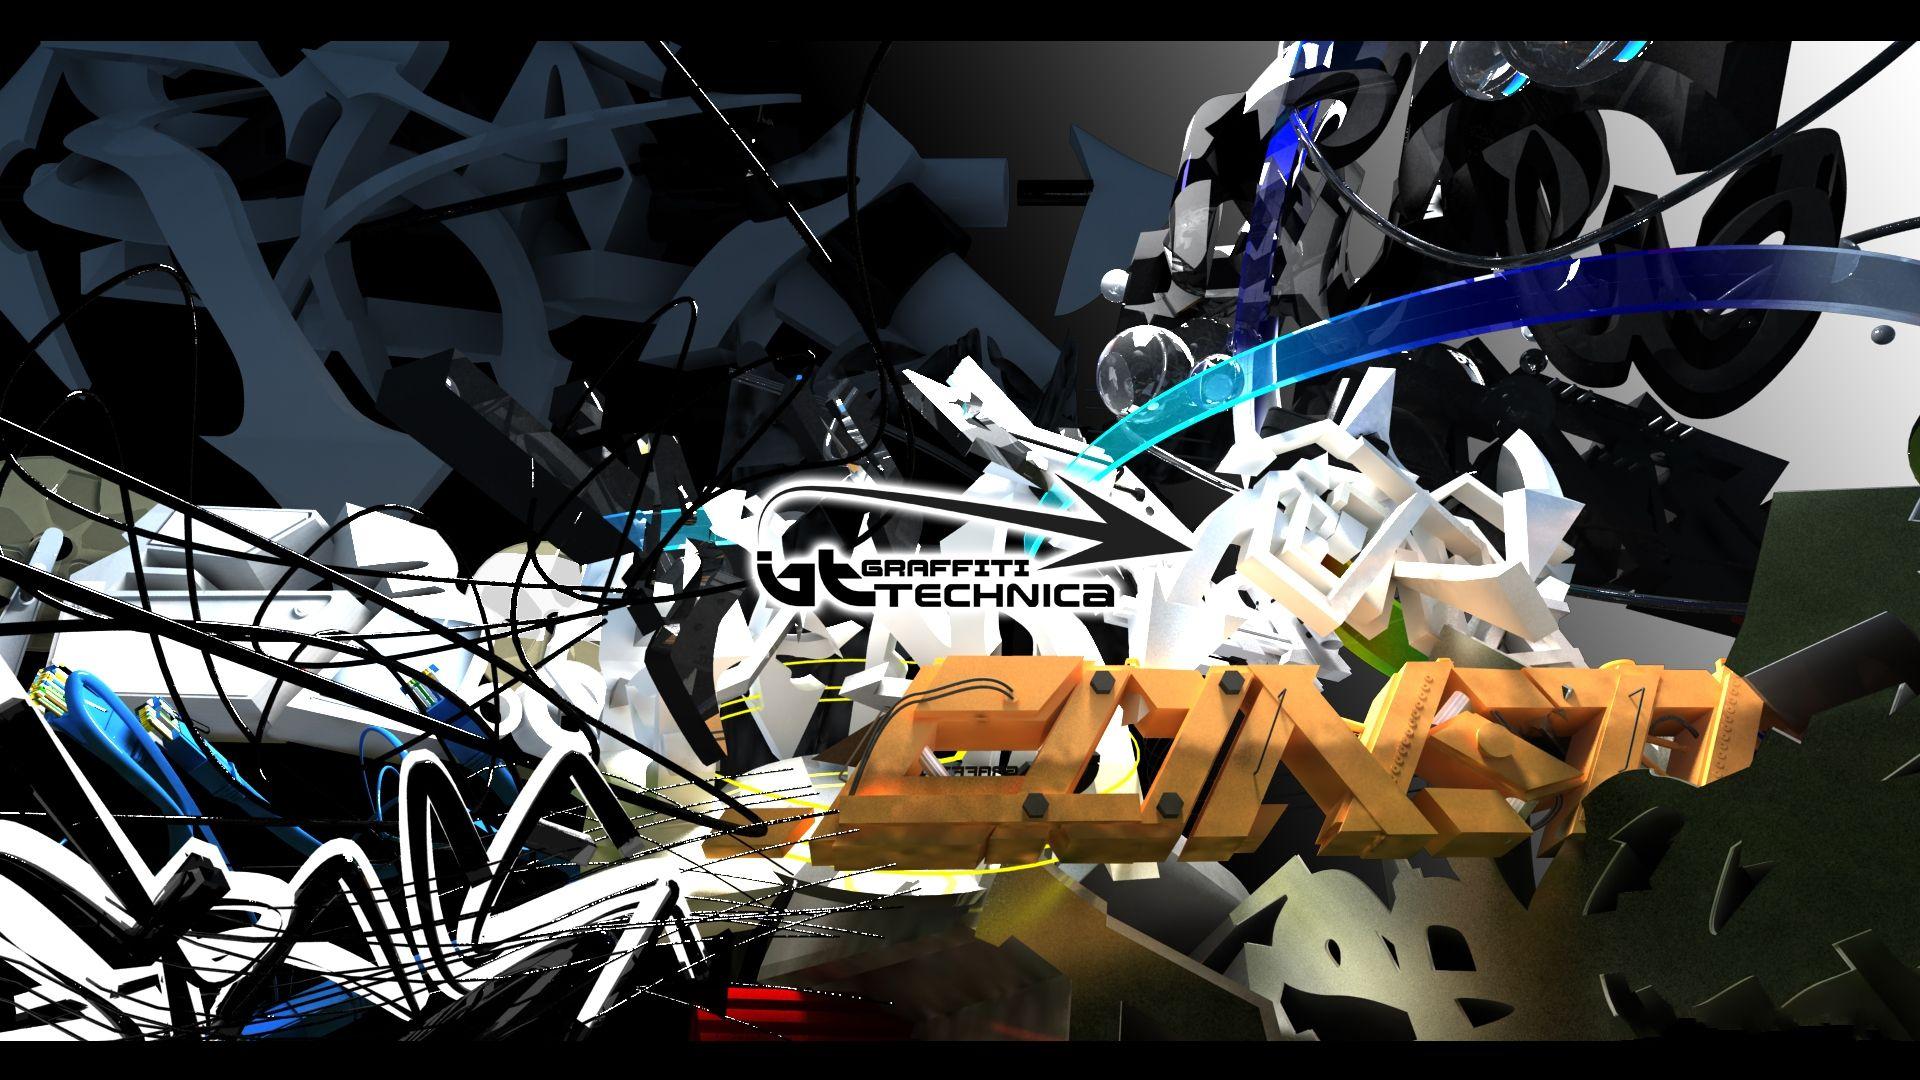 3d graffiti art wallpapers hd graffiti pinterest graffiti 3d graffiti art wallpapers hd voltagebd Image collections